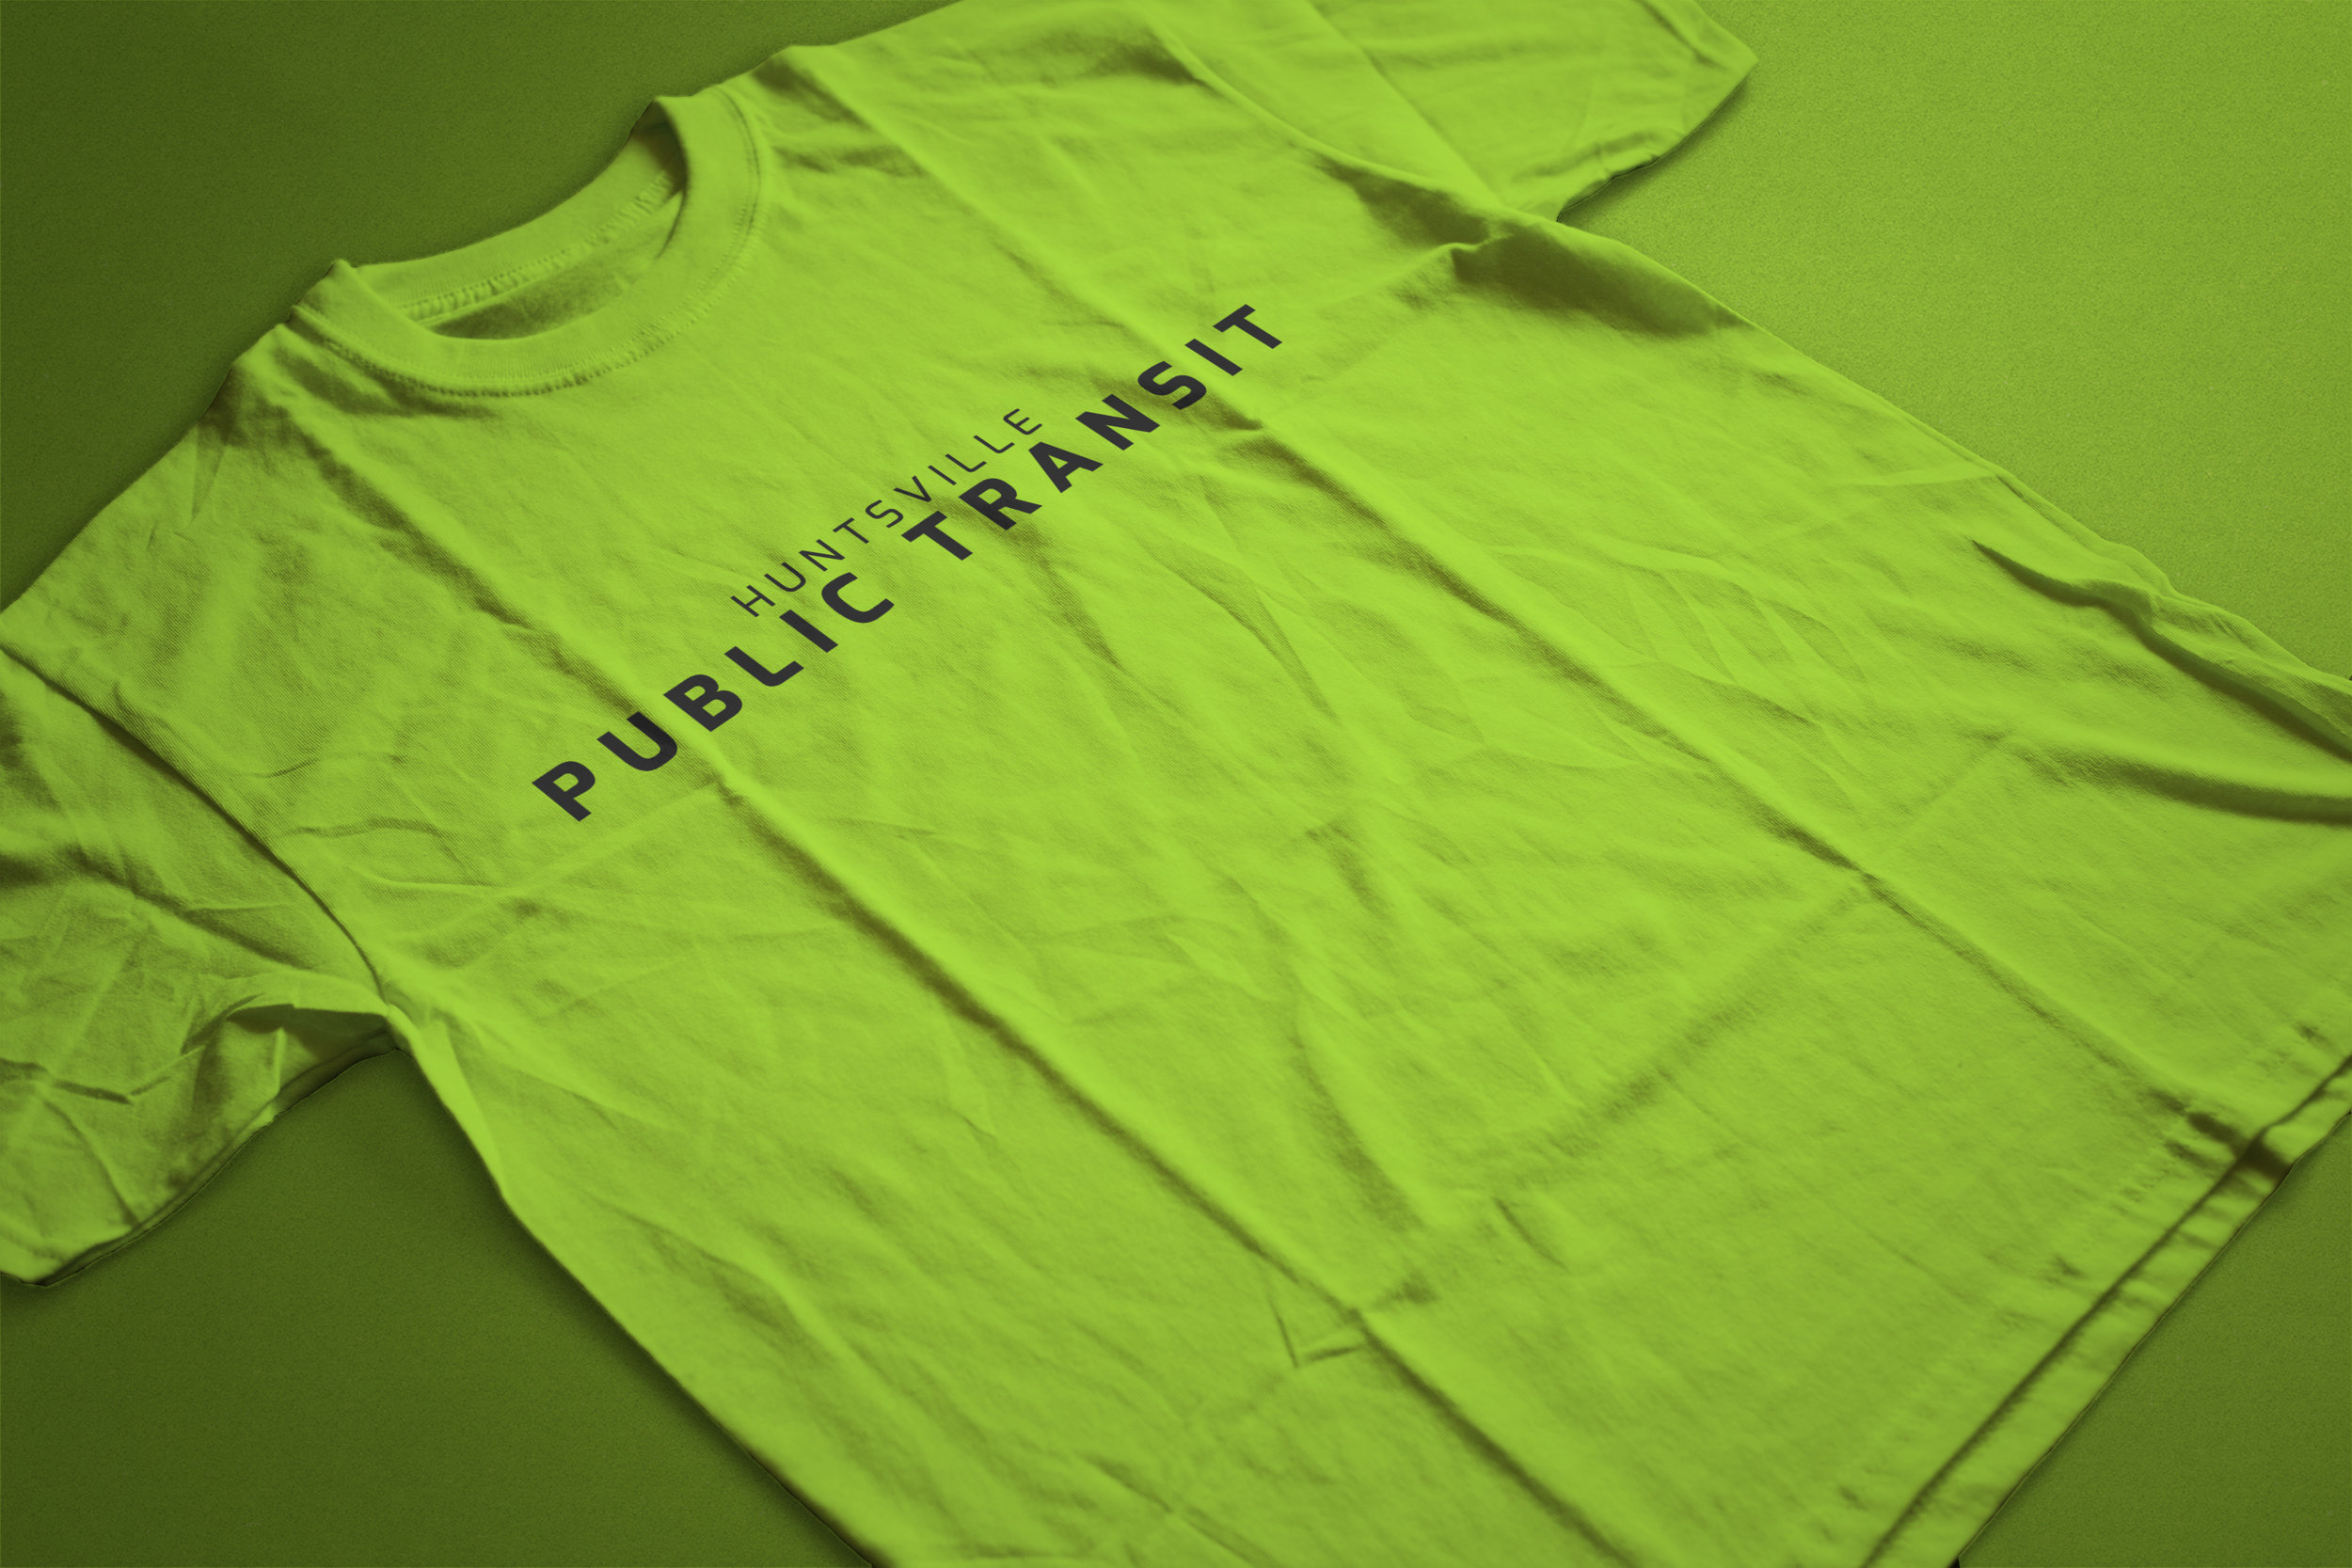 CityofHSV_PublicTransit_Rebrand_CONCEPT1_Shuttleshirt_R1-v1.jpg